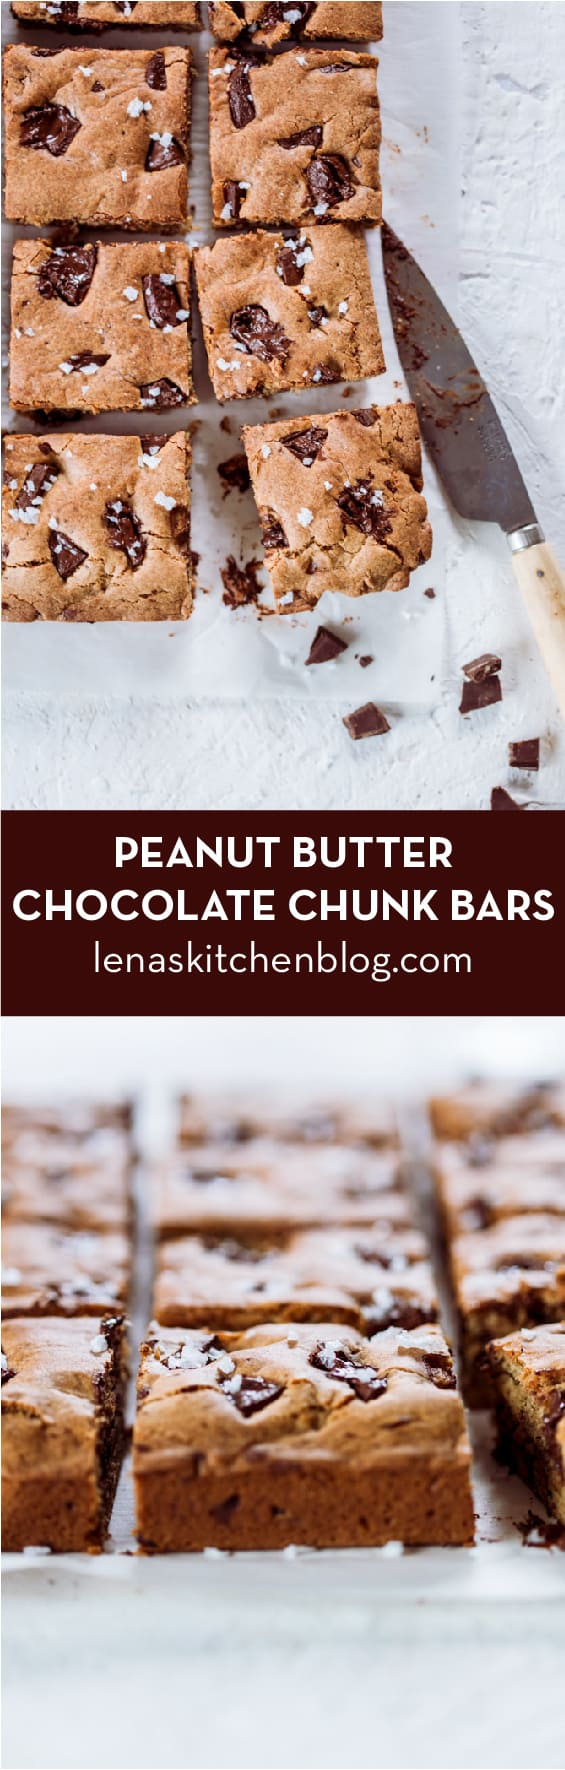 Peanut Butter Chocolate Chunk Bars Baking Challenge by lenaskitchenblog.com